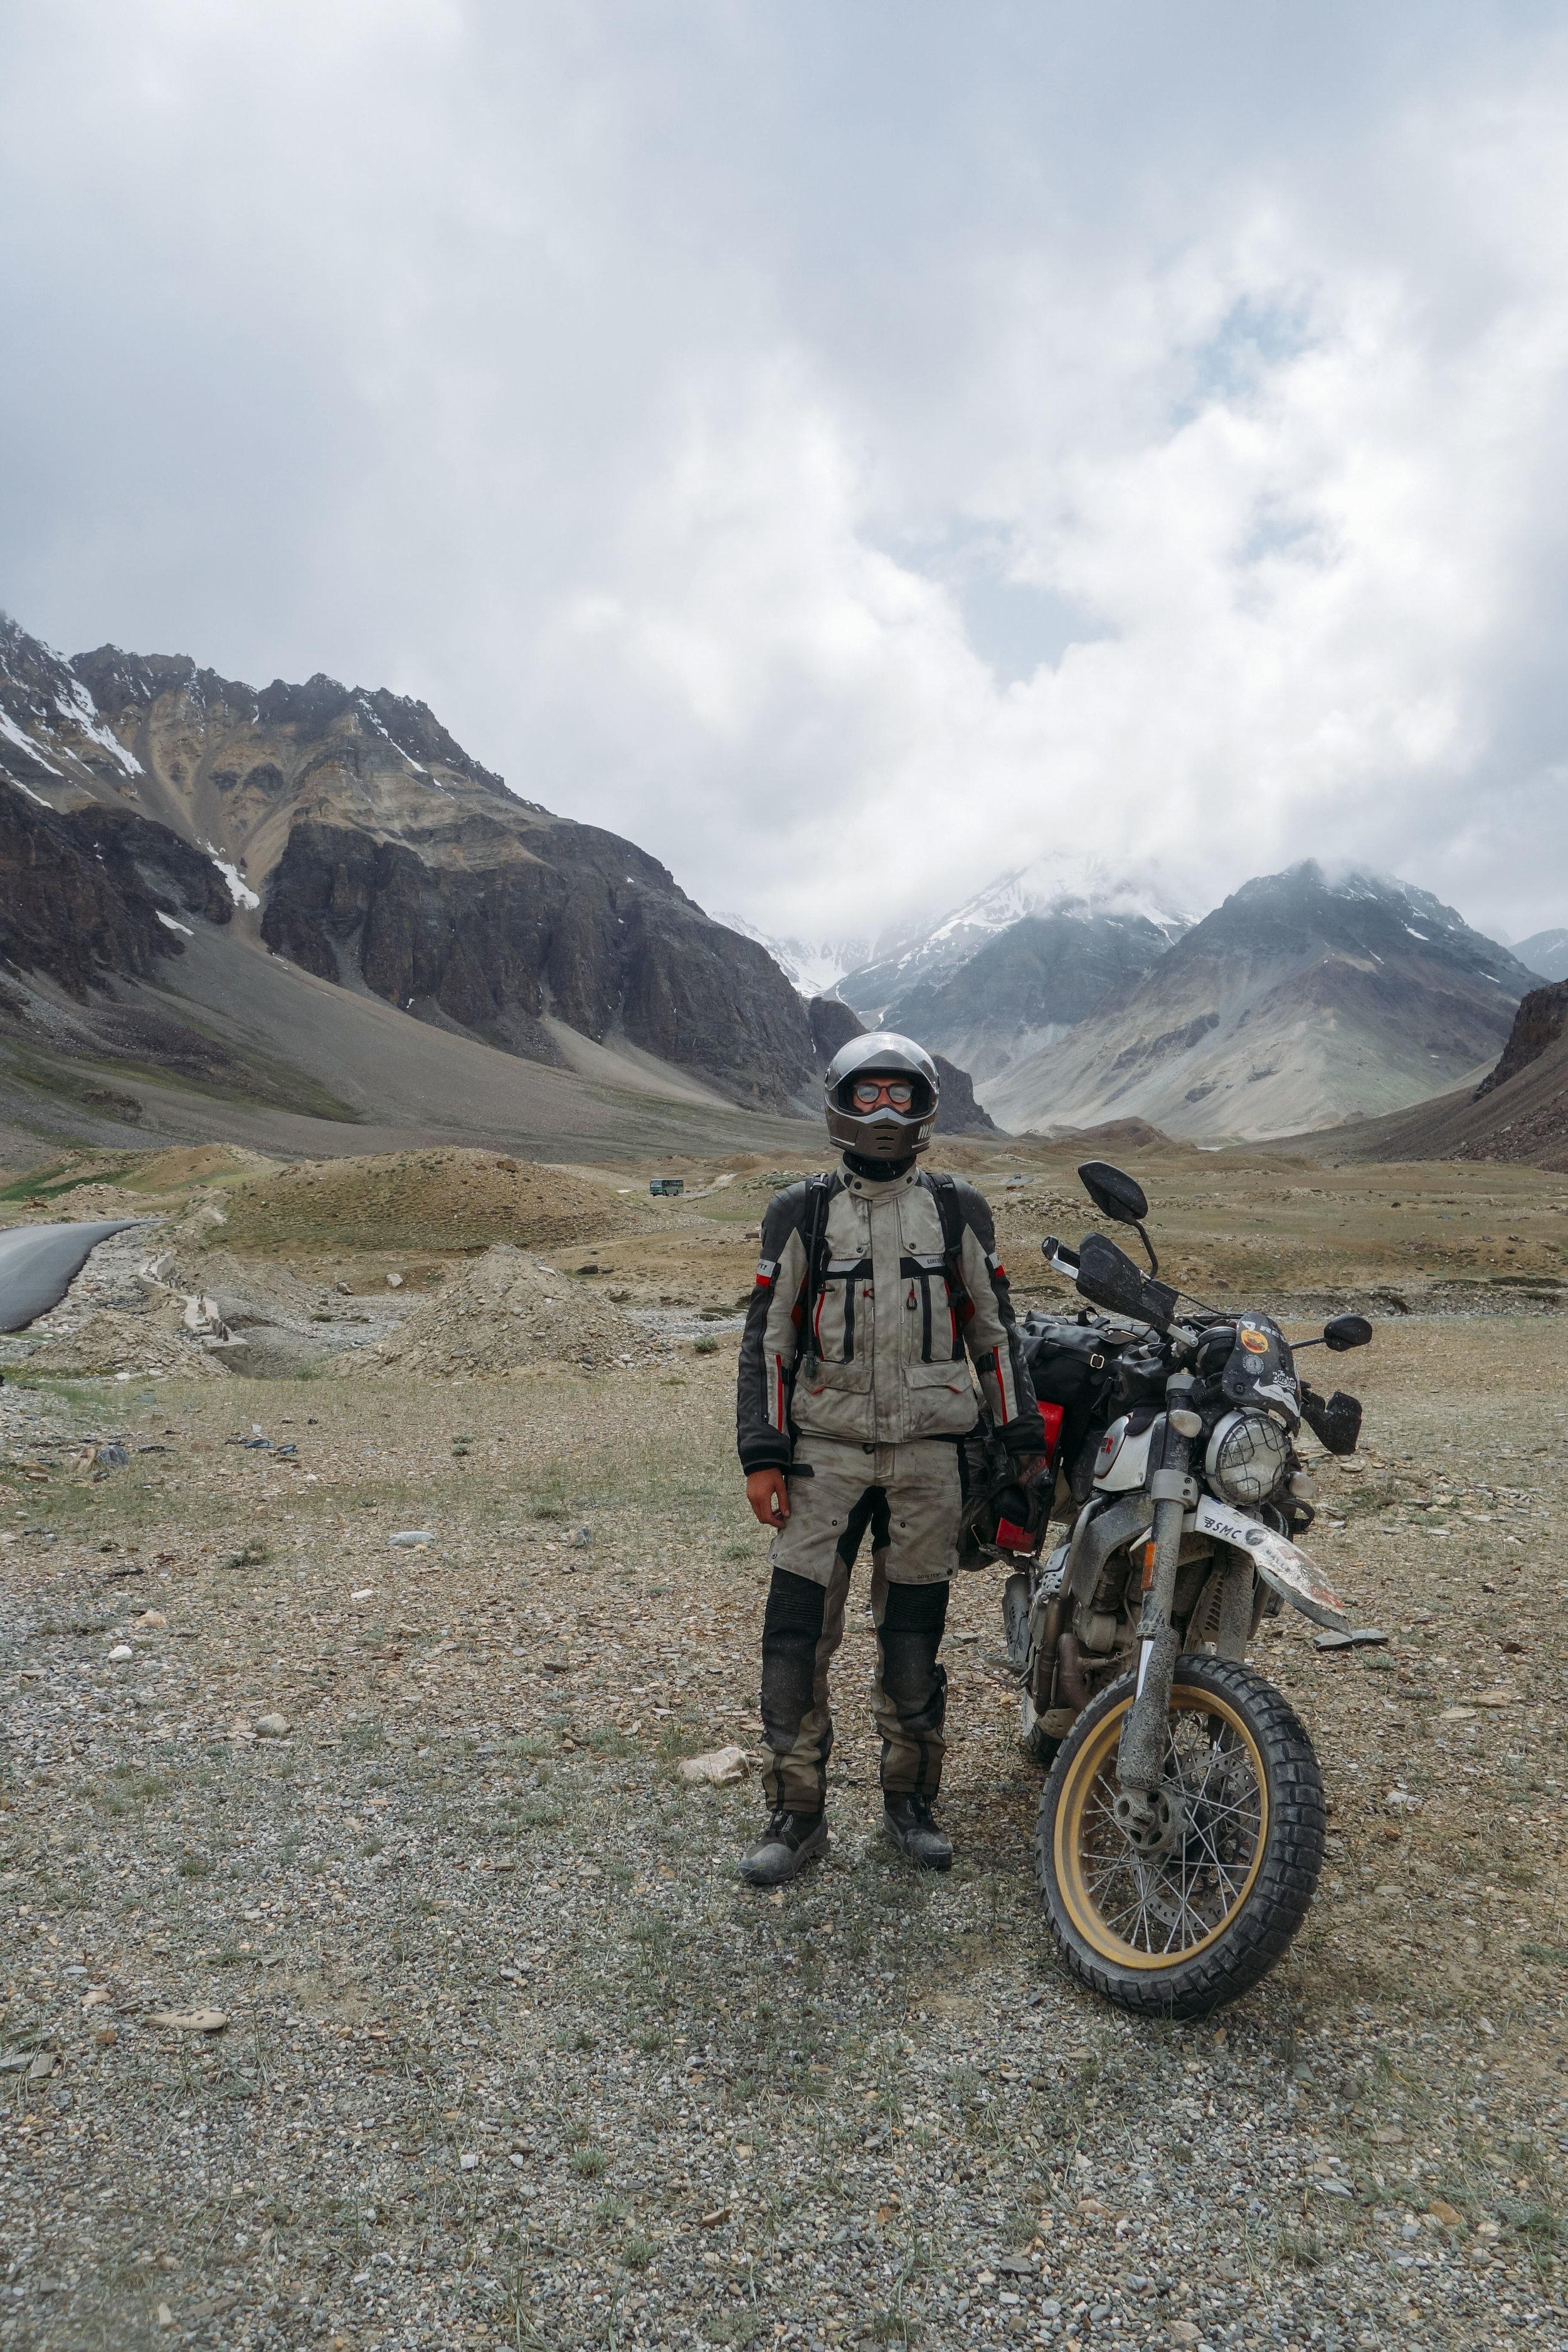 Henry-Crew-35000Miles-Adventure-Rider-Radio-Motorcycle-Podcast-4.jpg